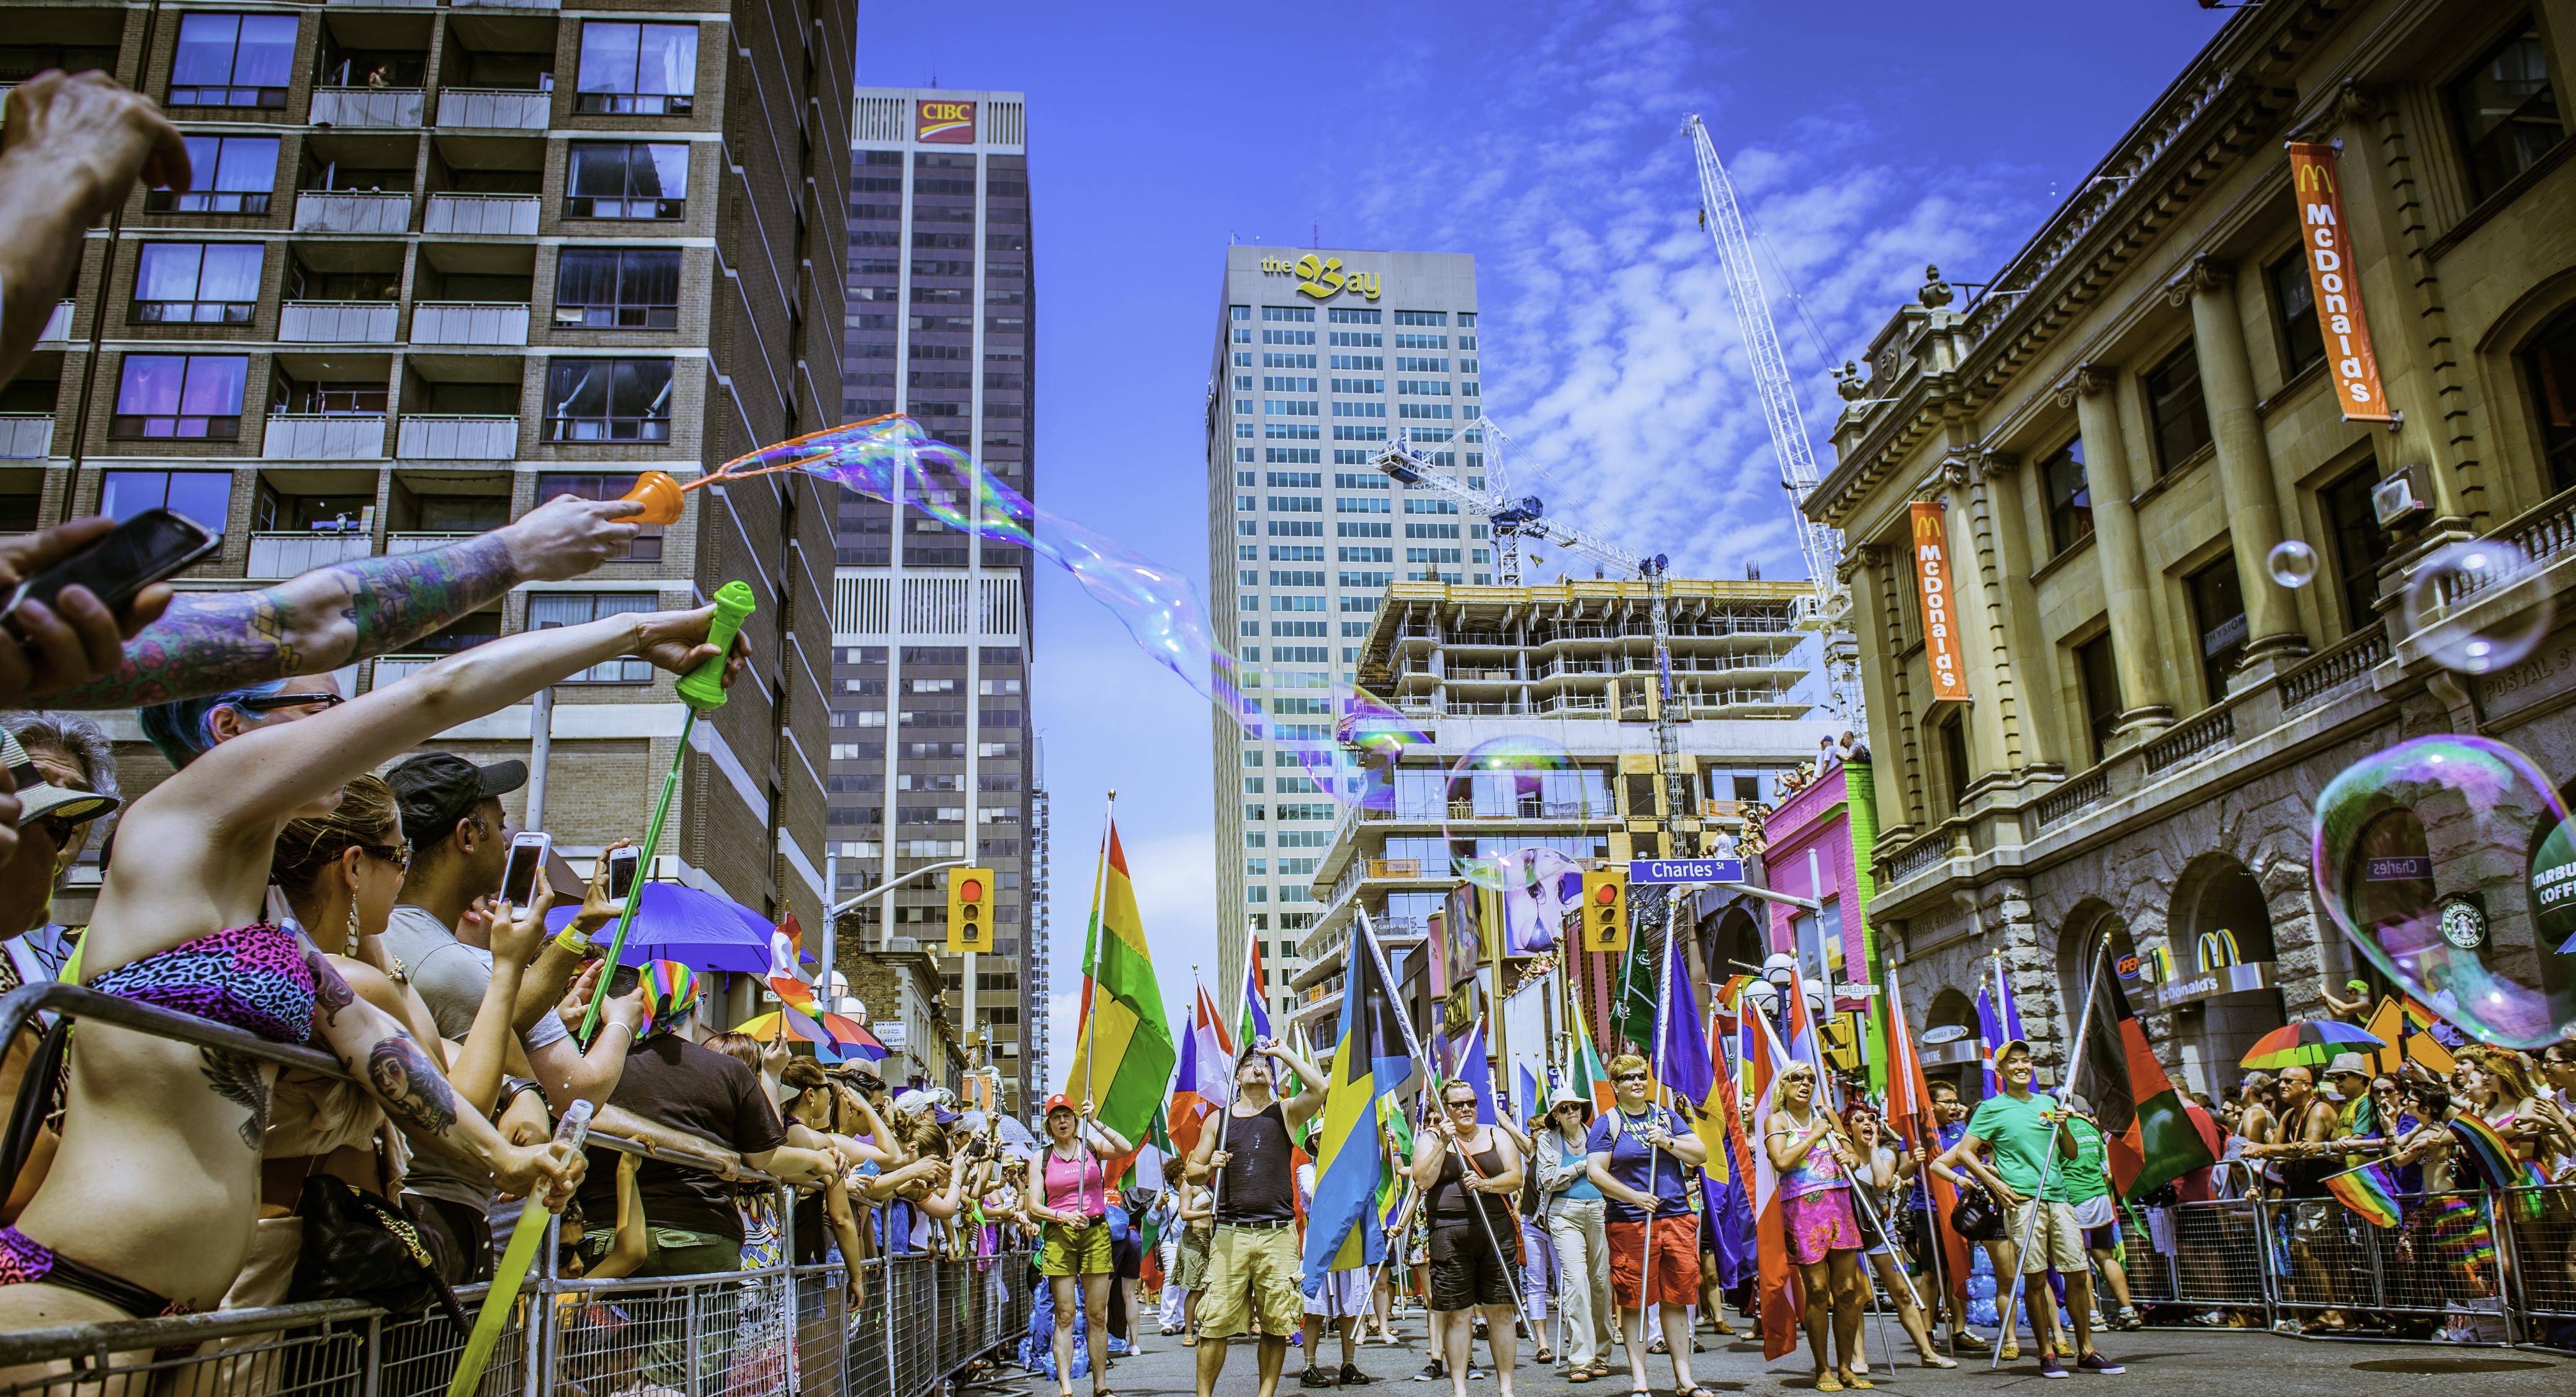 Pride toronto 2014 worldpride pride parade photo by scott corman 006